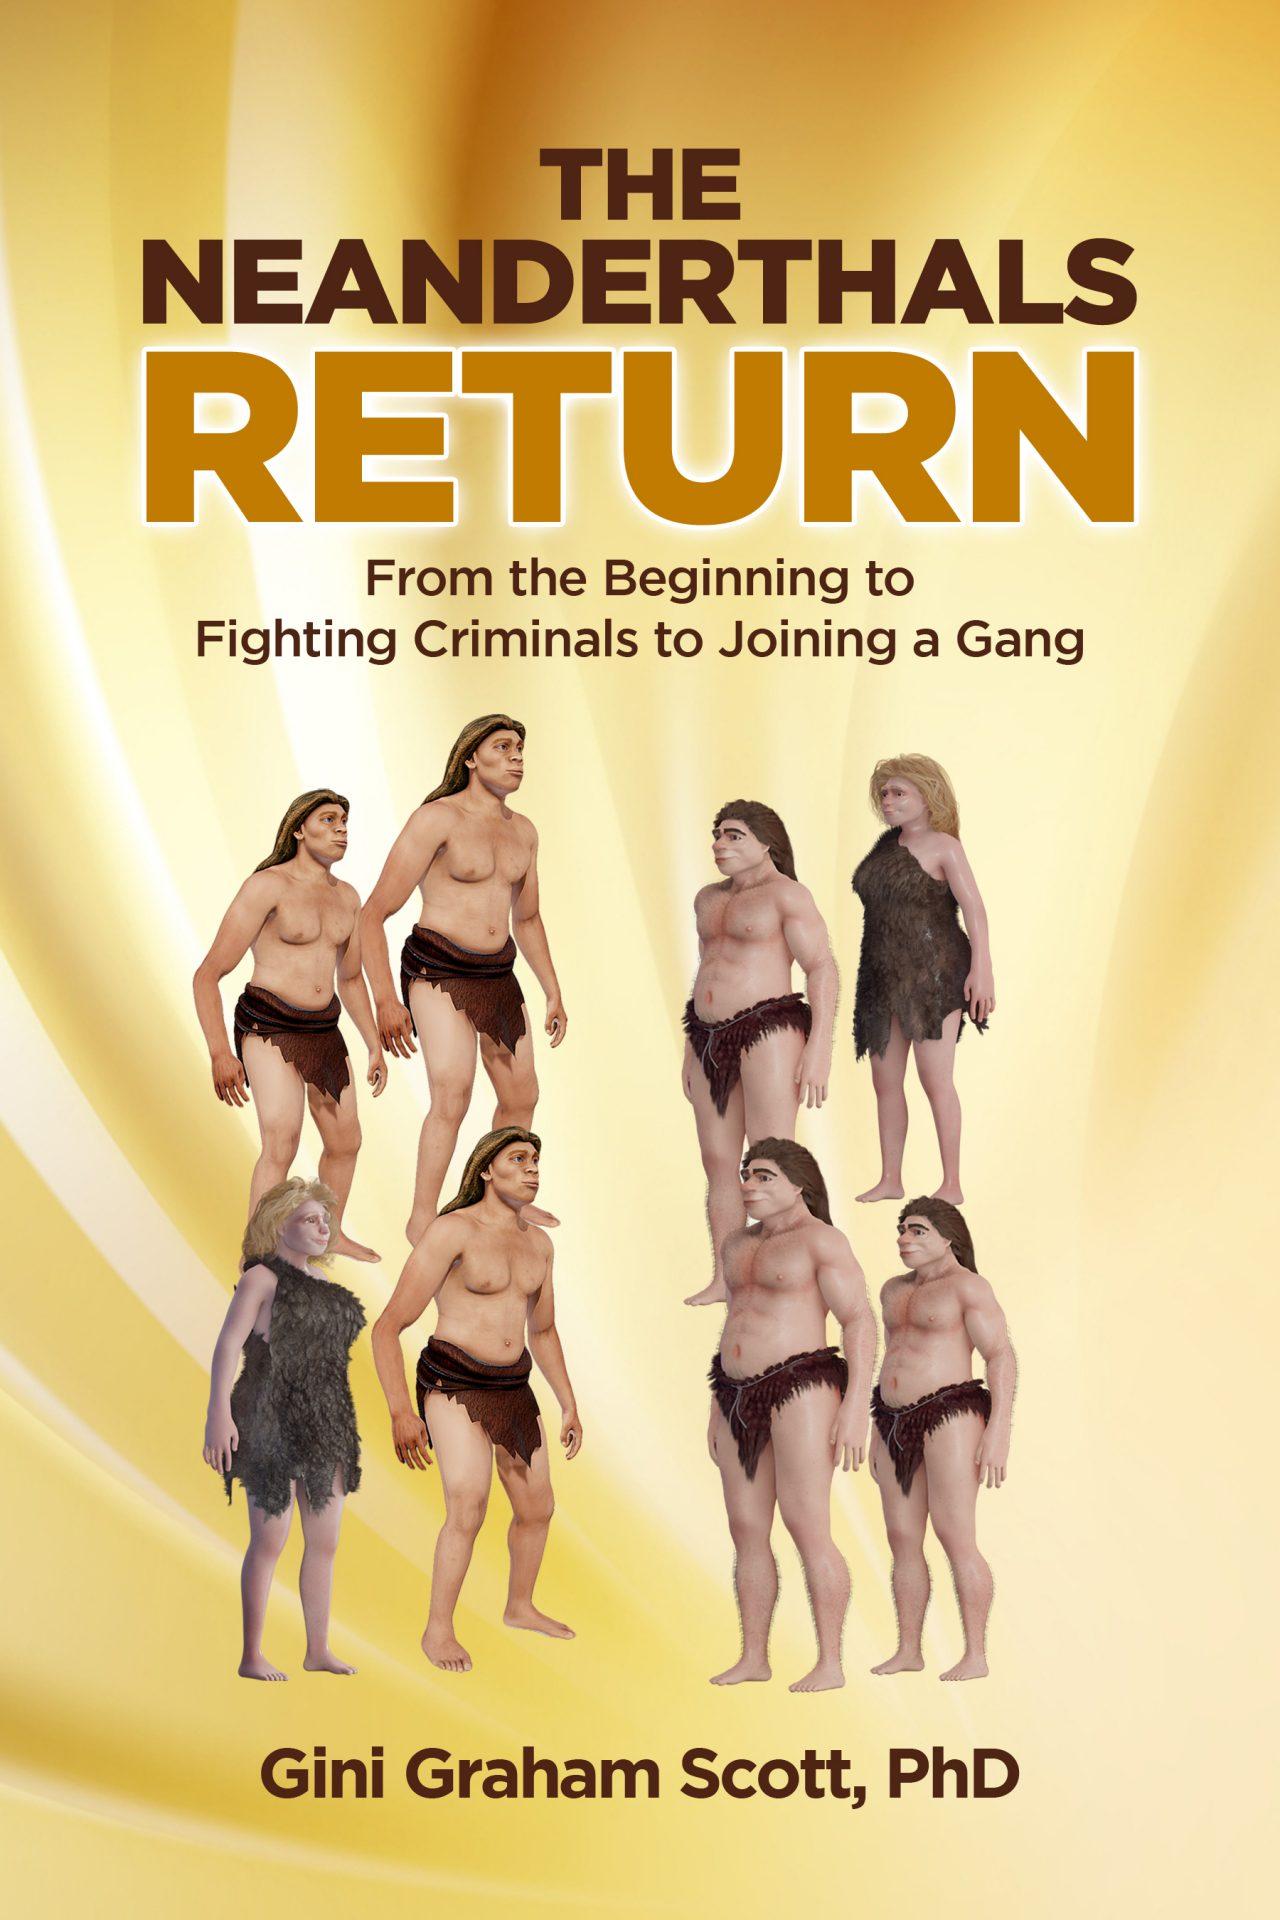 The Neanderthals Return Poster